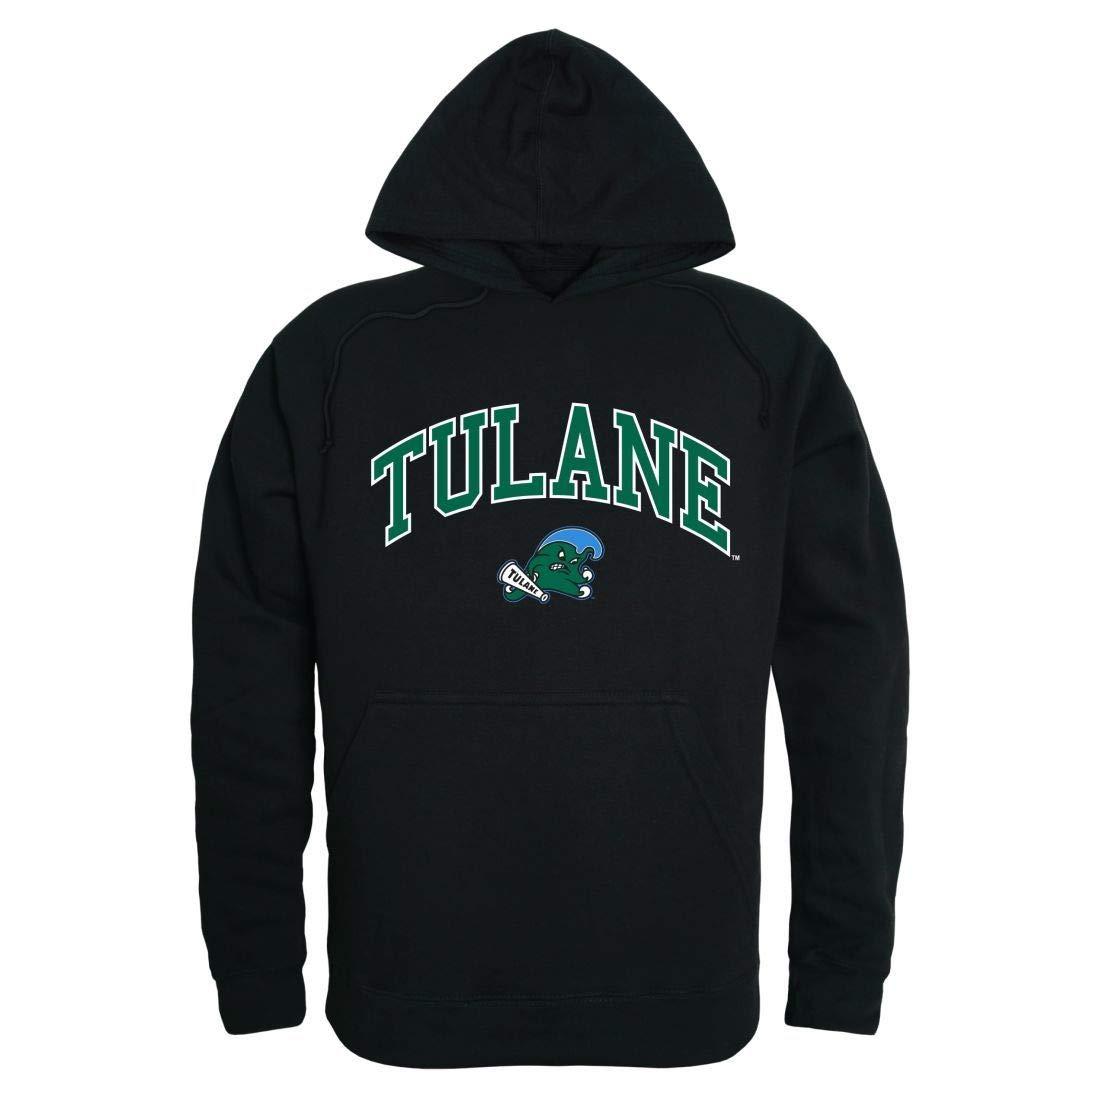 6fb2b689 W Republic Apparel Tulane Tulane Tulane University Green Wave Campus Hoodie  Sweatshirt Black 5565fc